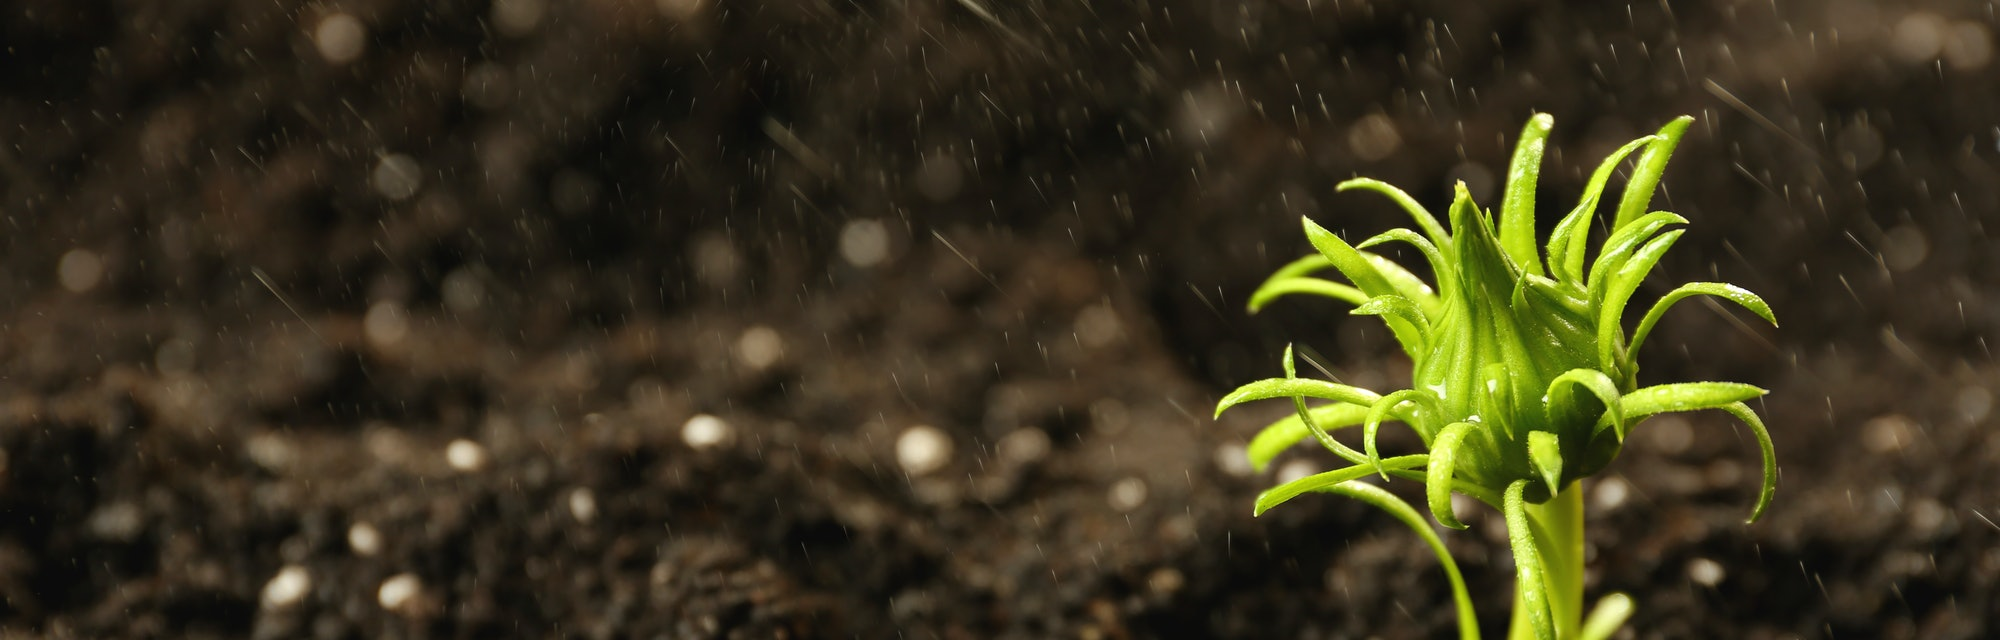 Fresh green plant in fertile soil under rain, space for text